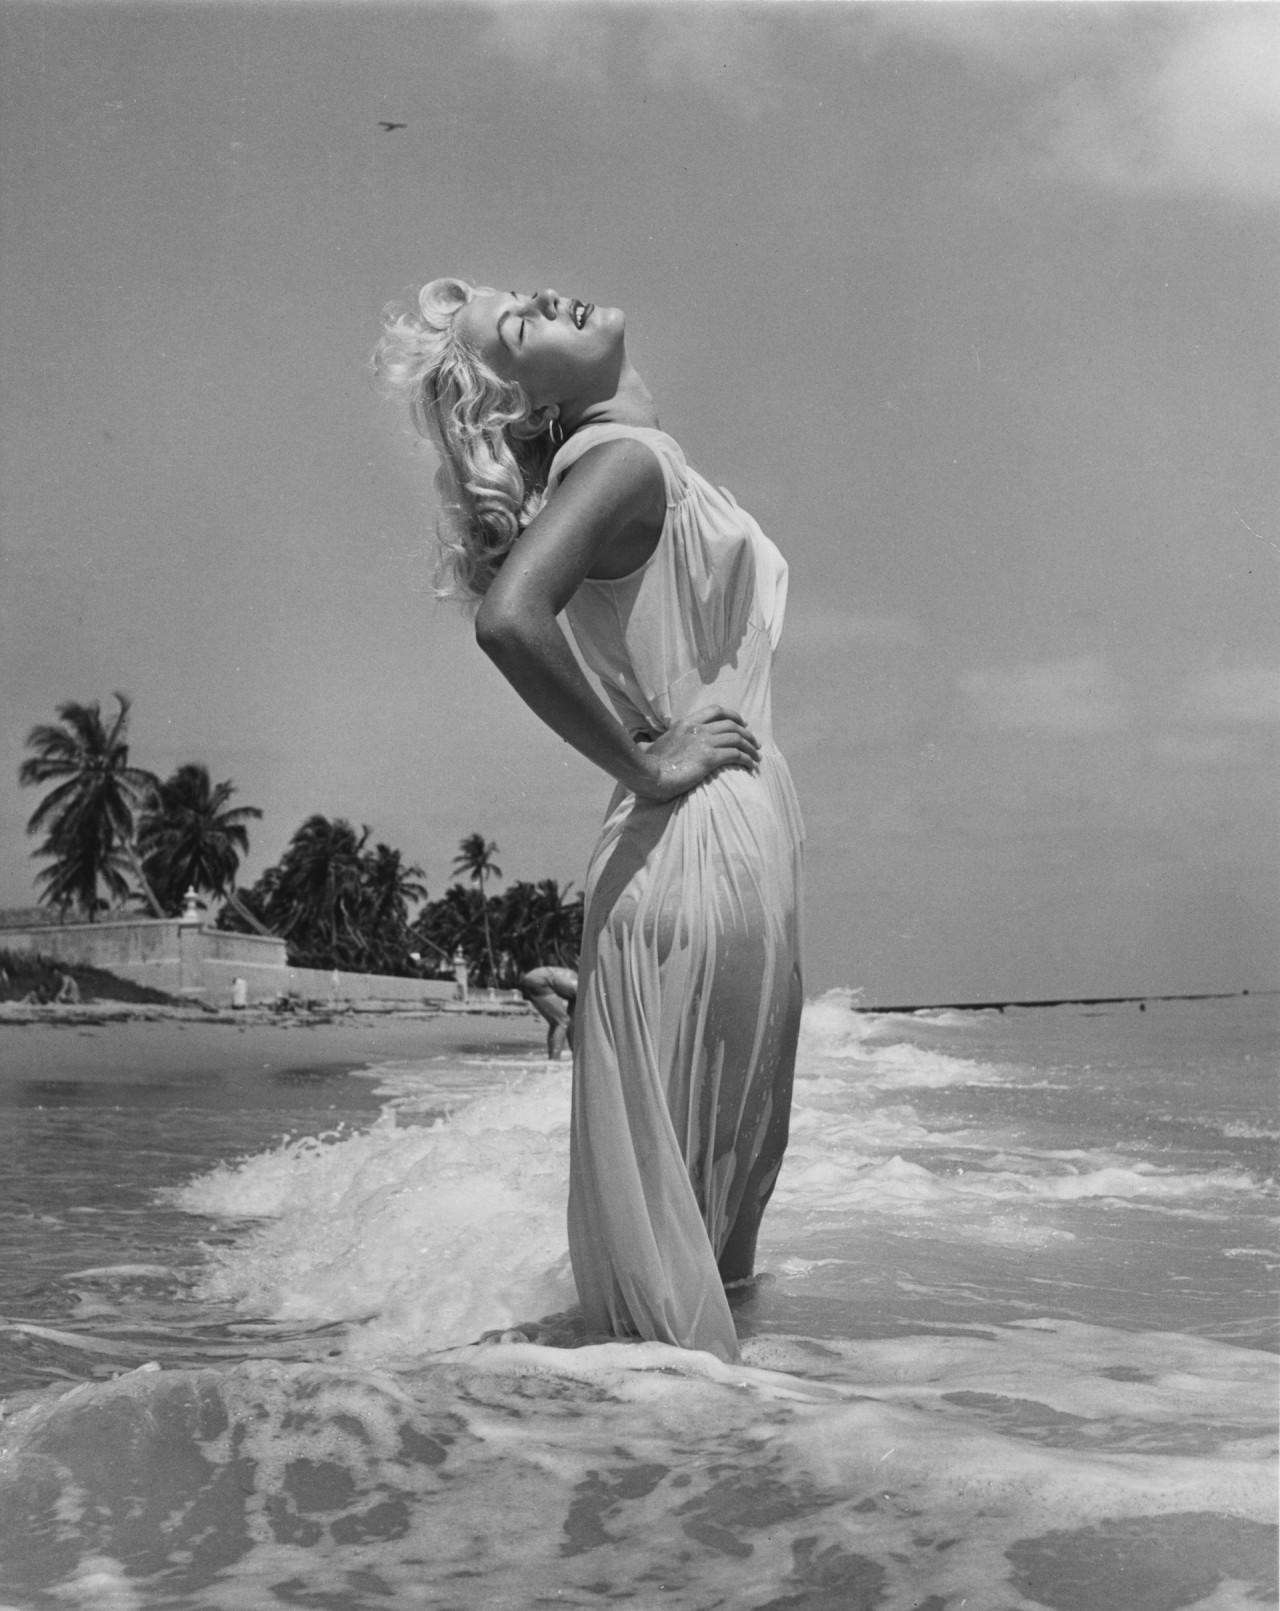 Сэнди Фултон, 1954. Банни Йеджер